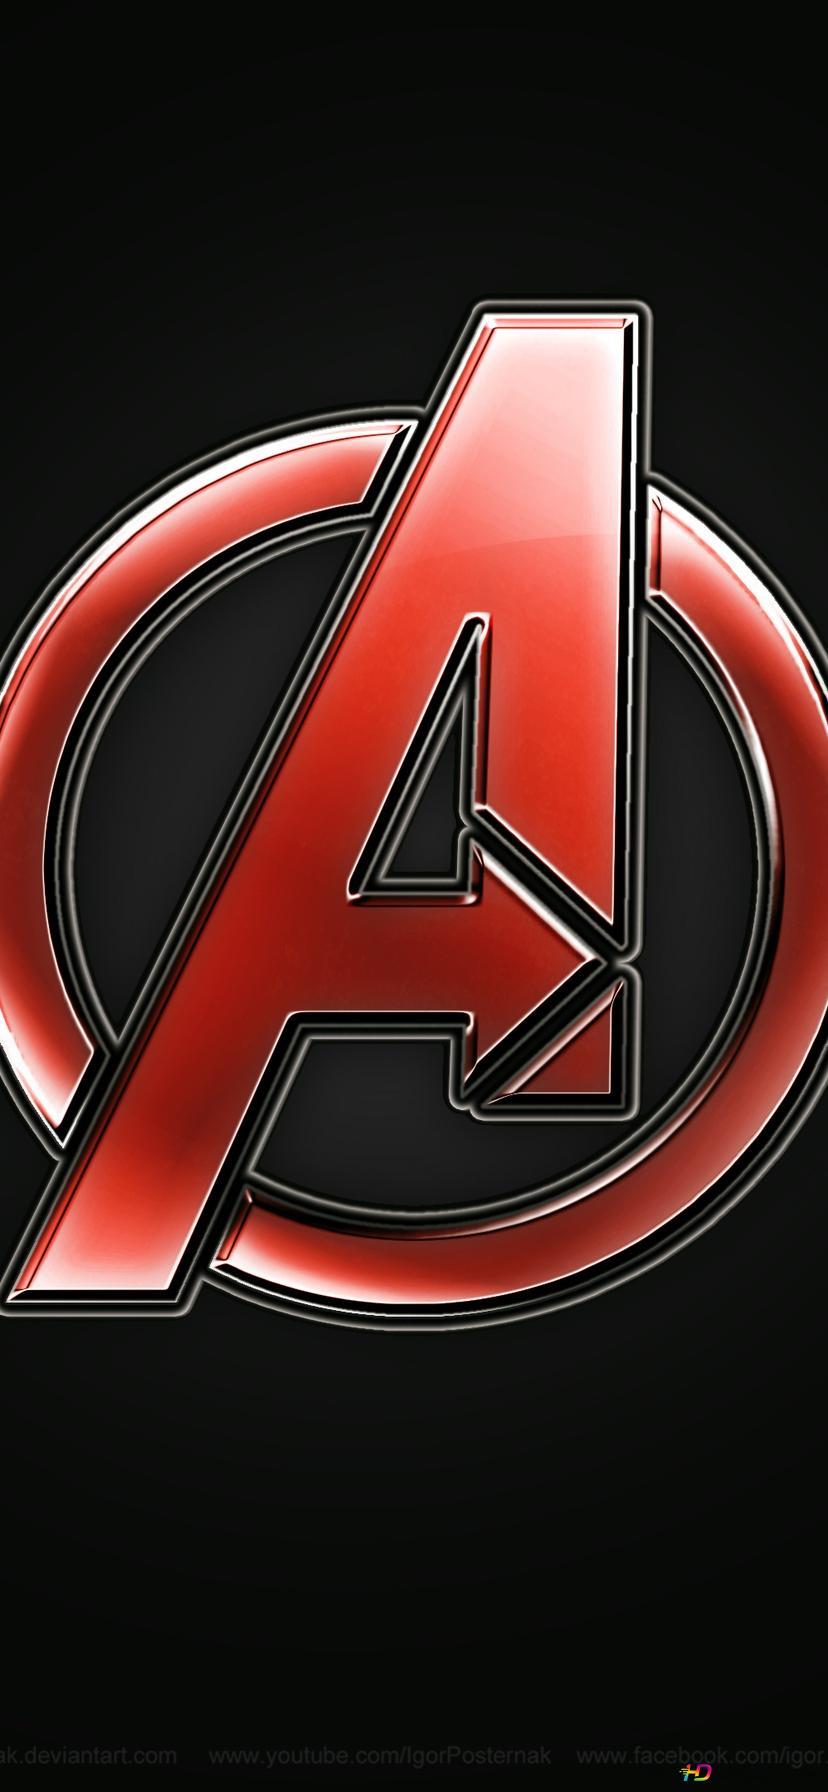 Avengers Movie Logo Hd Wallpaper Download